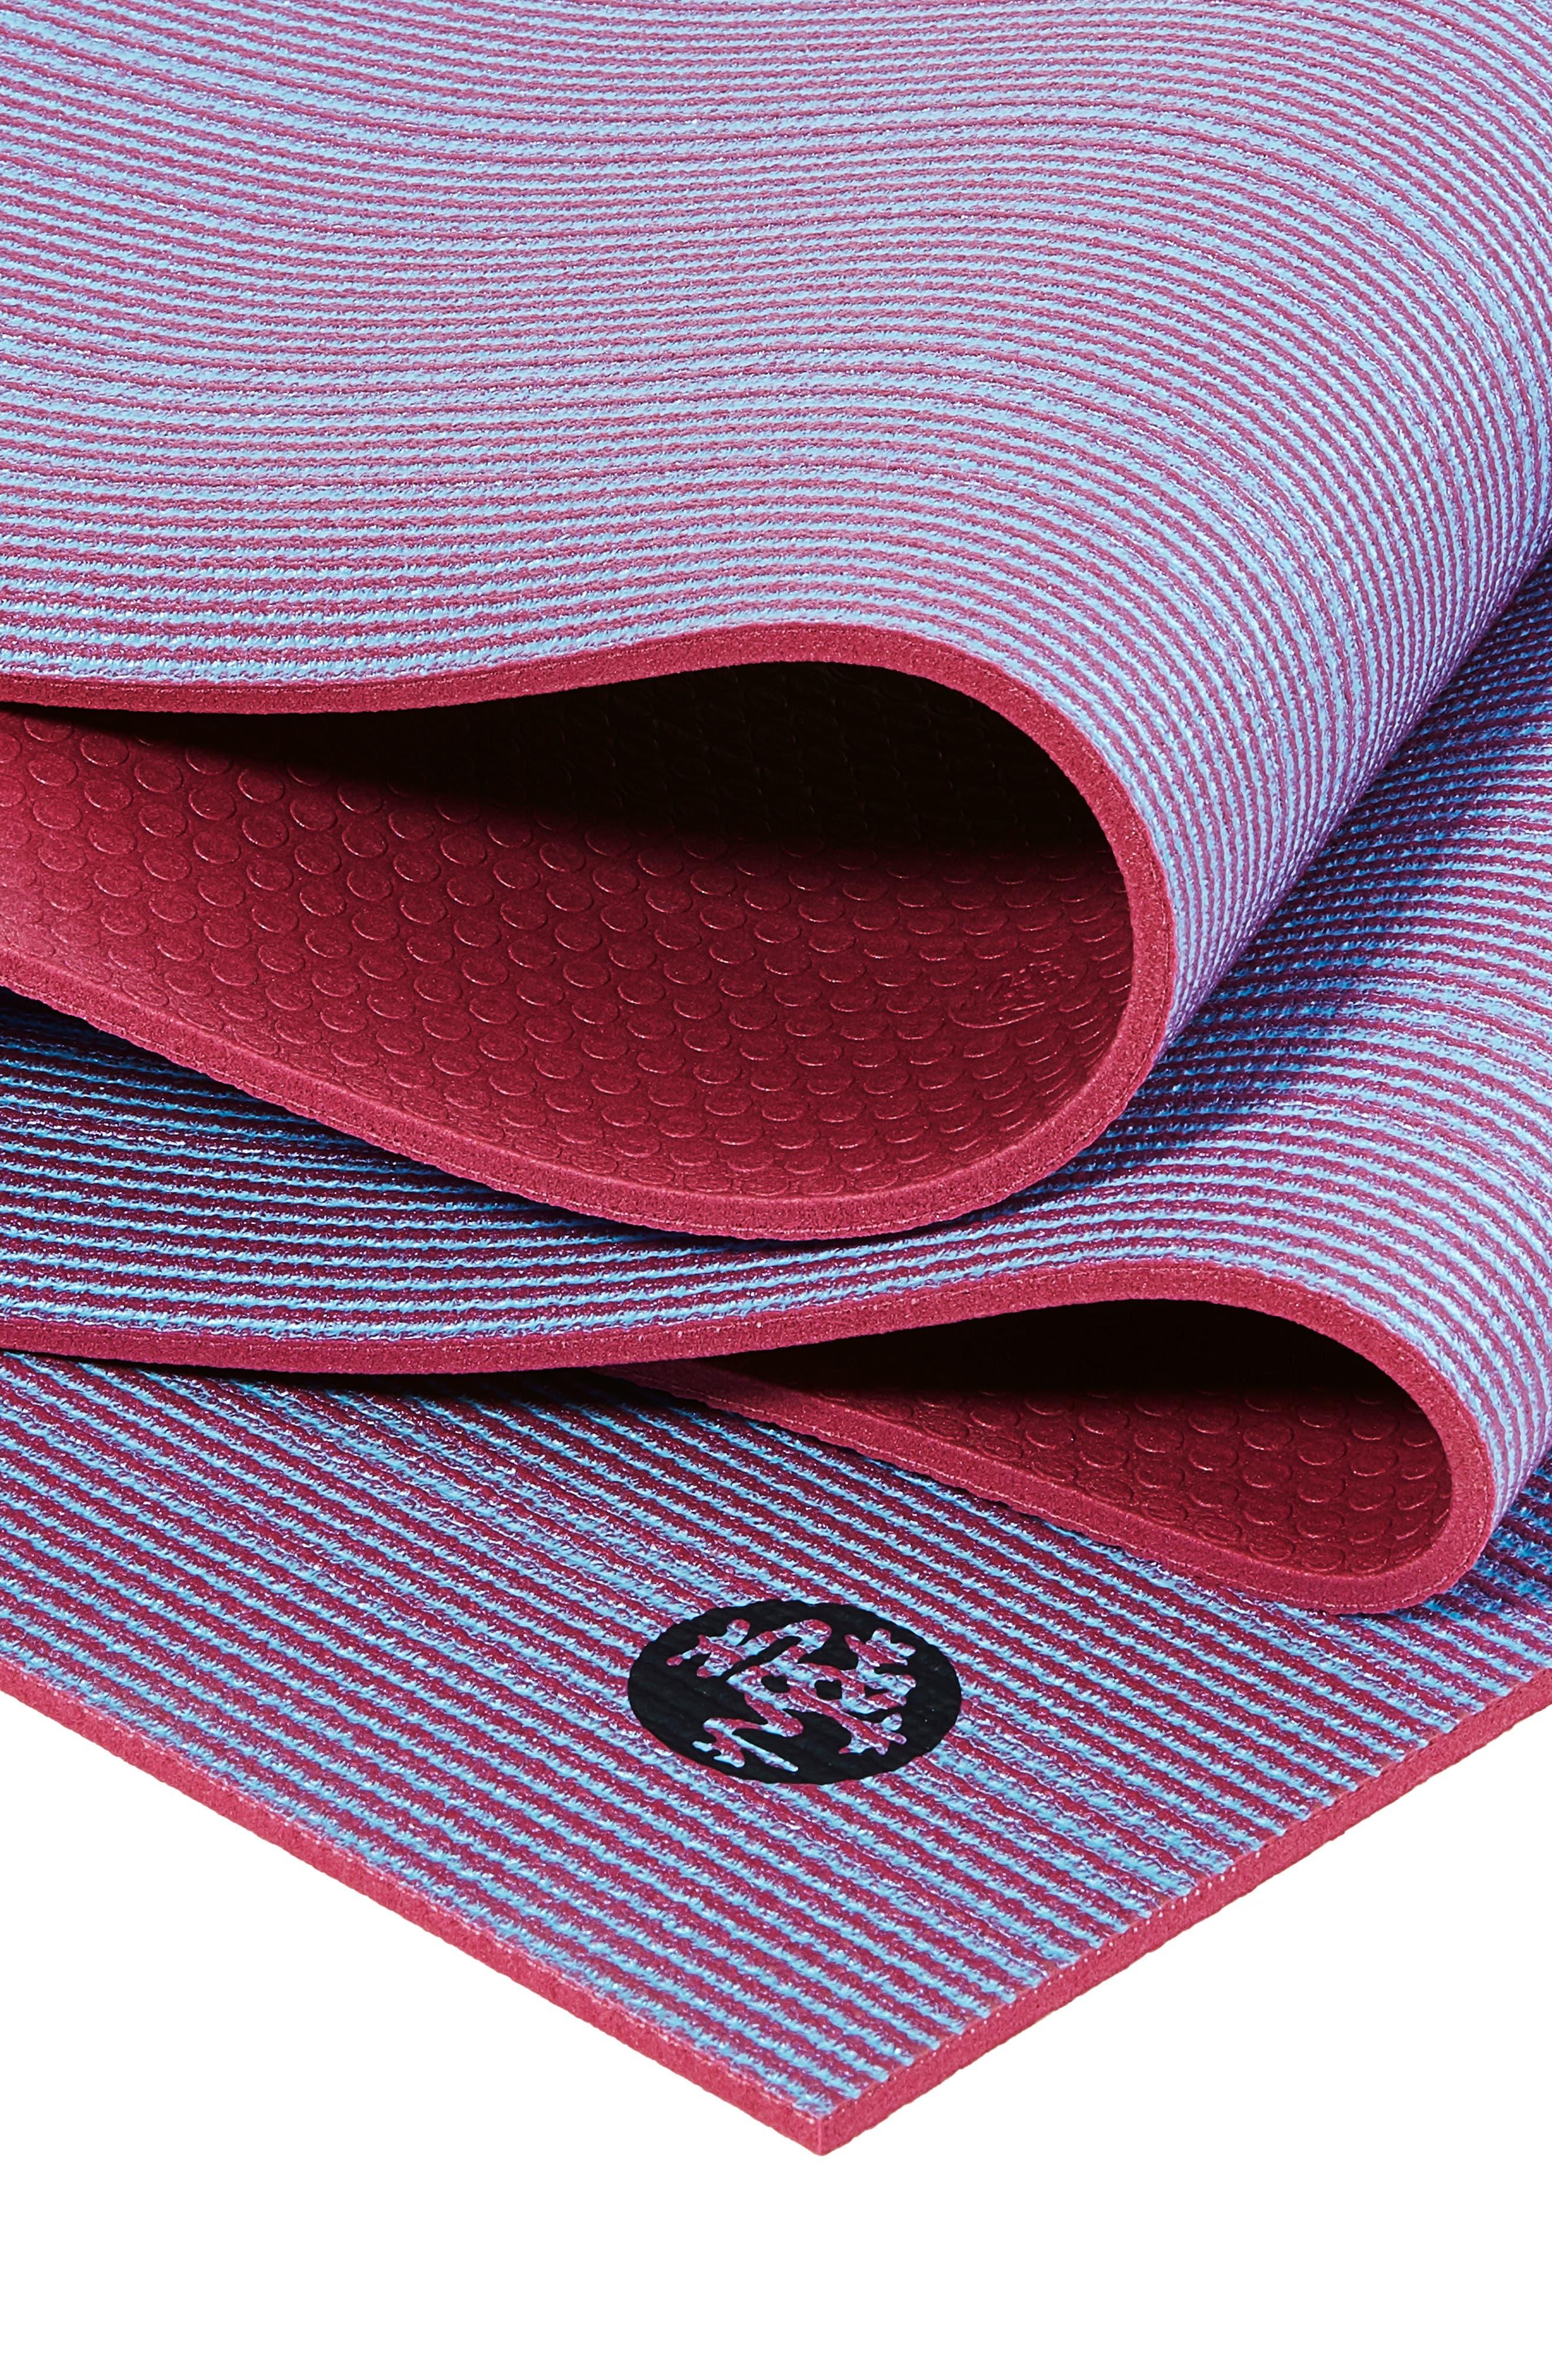 PROlite<sup>®</sup> Yoga Mat,                             Alternate thumbnail 2, color,                             505